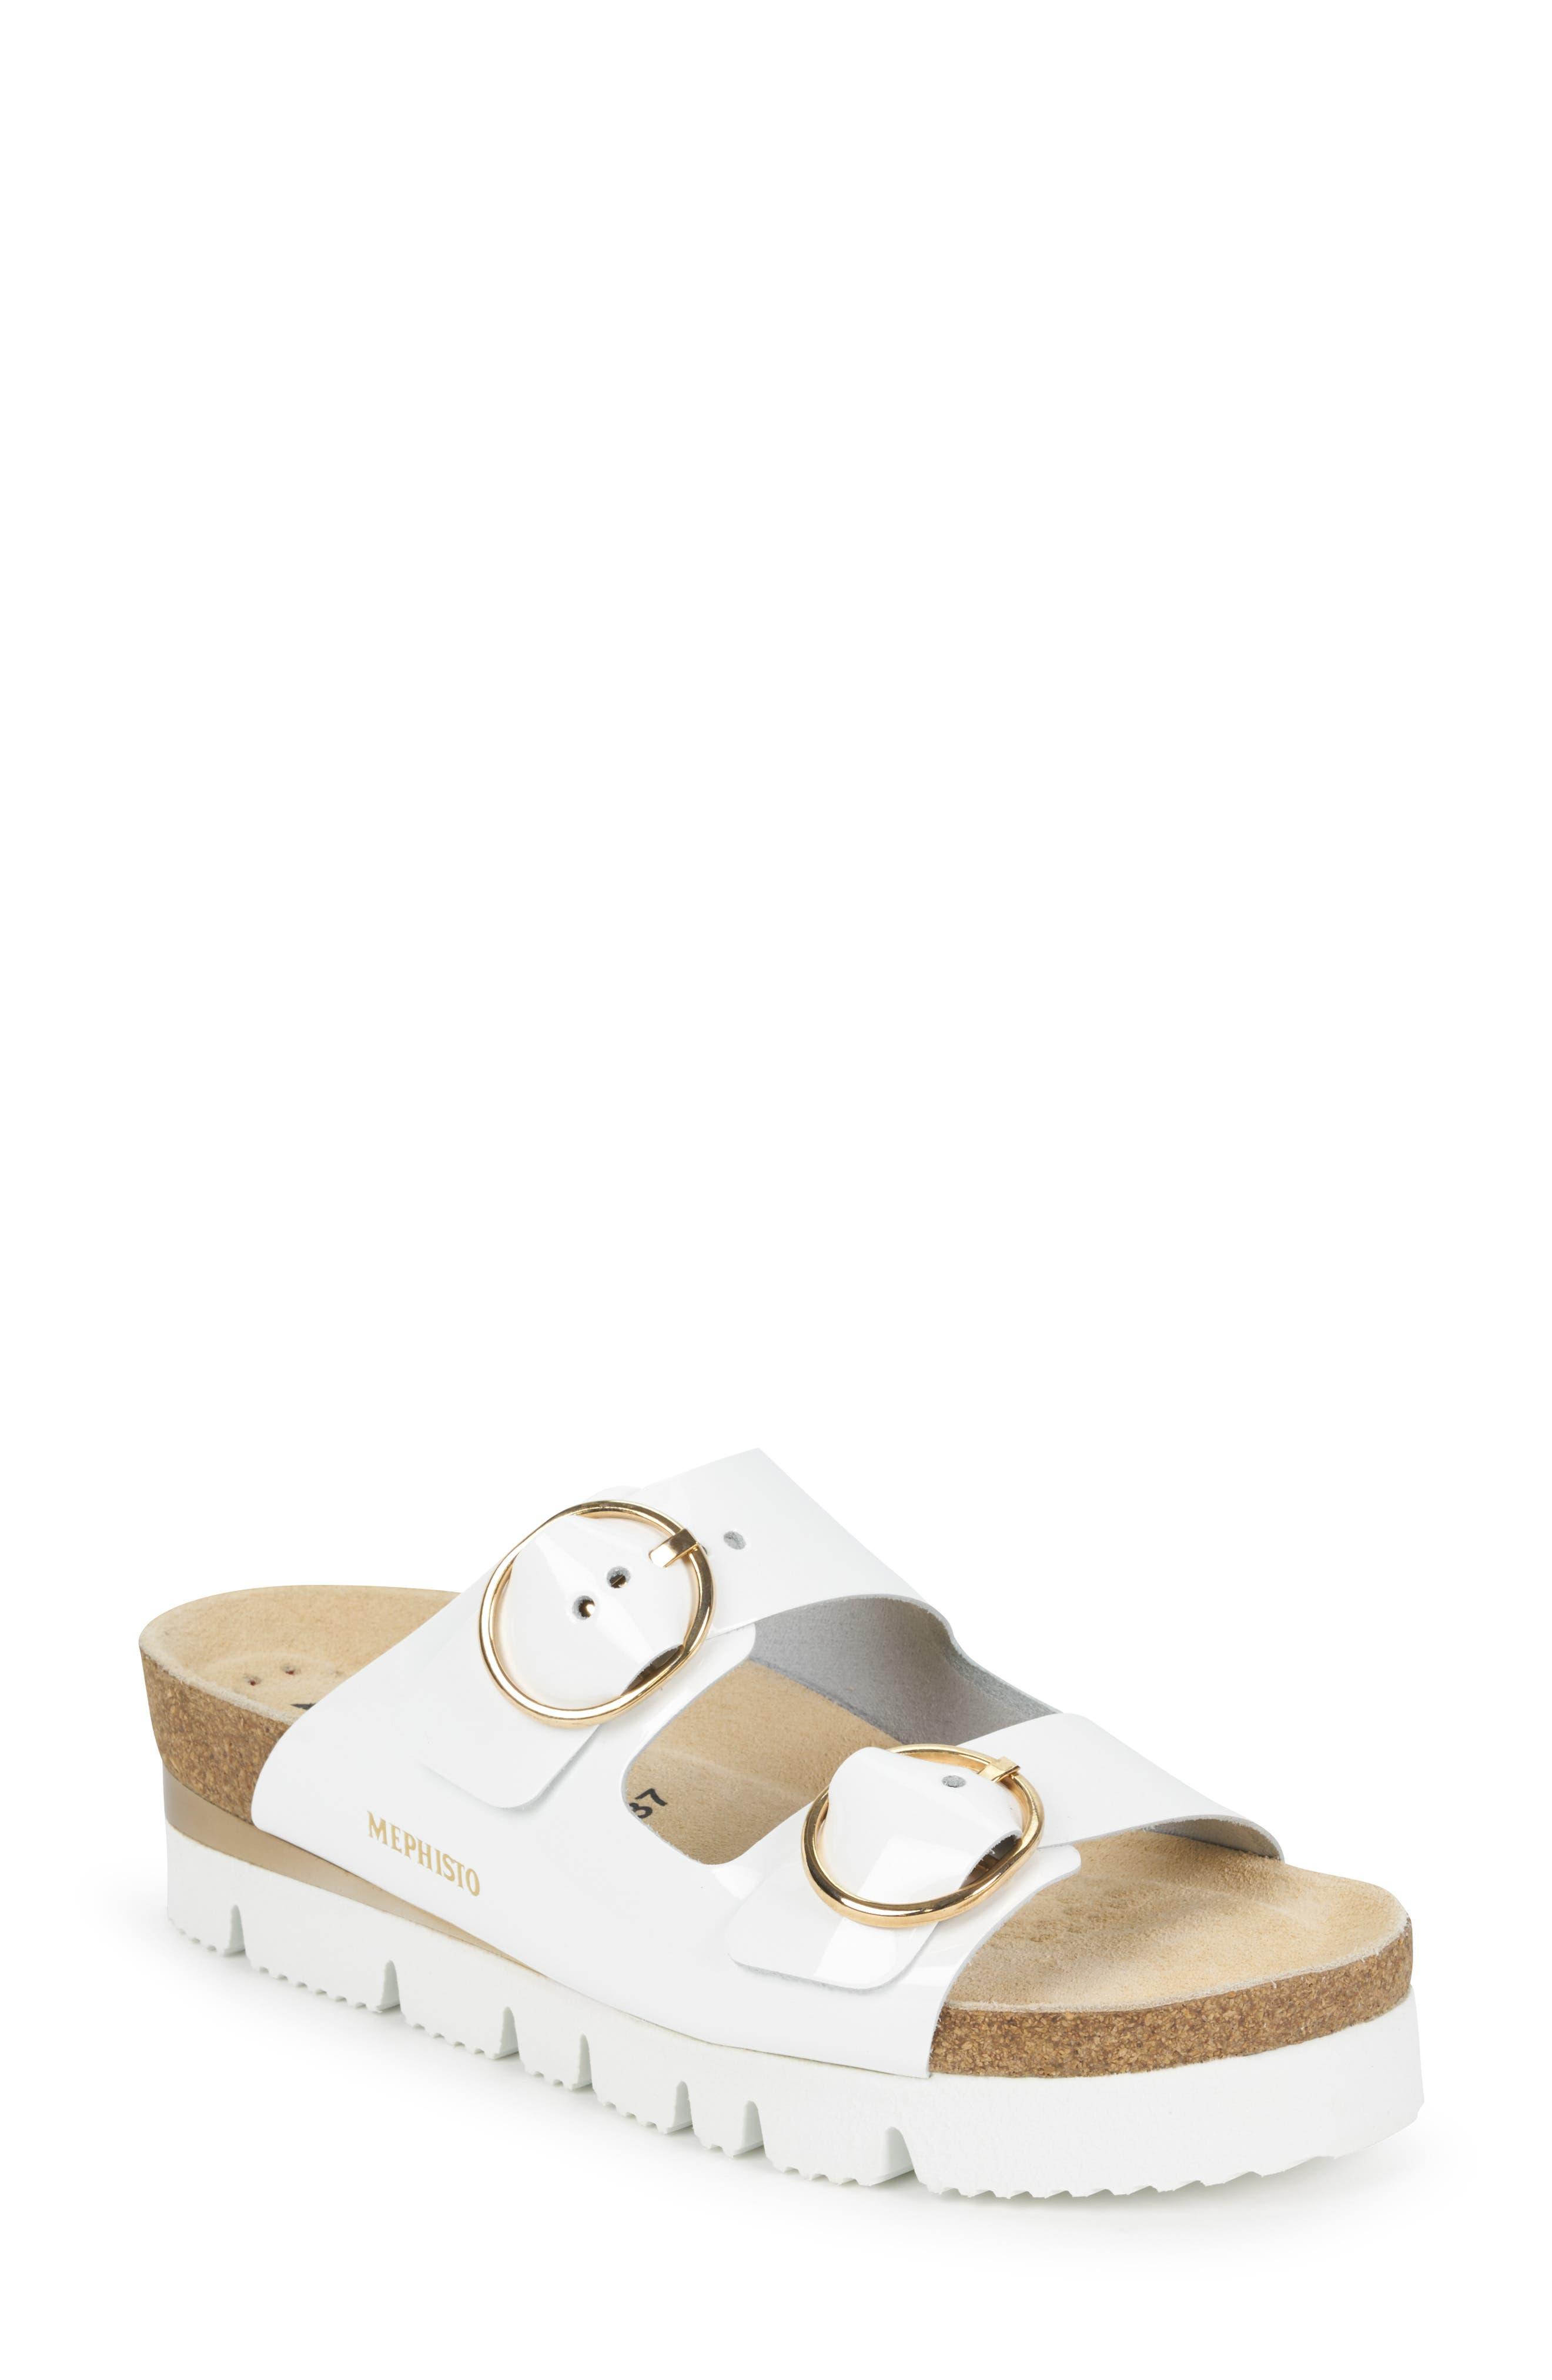 MEPHISTO, Vandy Slide Sandal, Main thumbnail 1, color, WHITE PATENT LEATHER